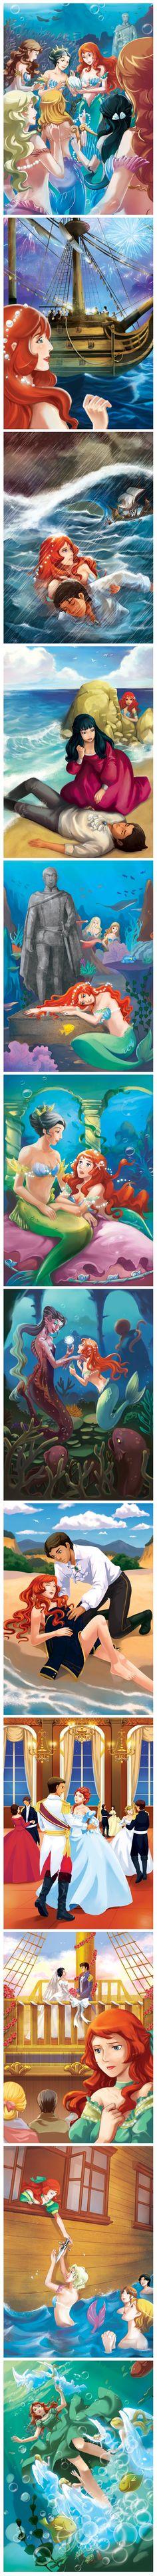 The Little Mermaid by Petshopbox Studio